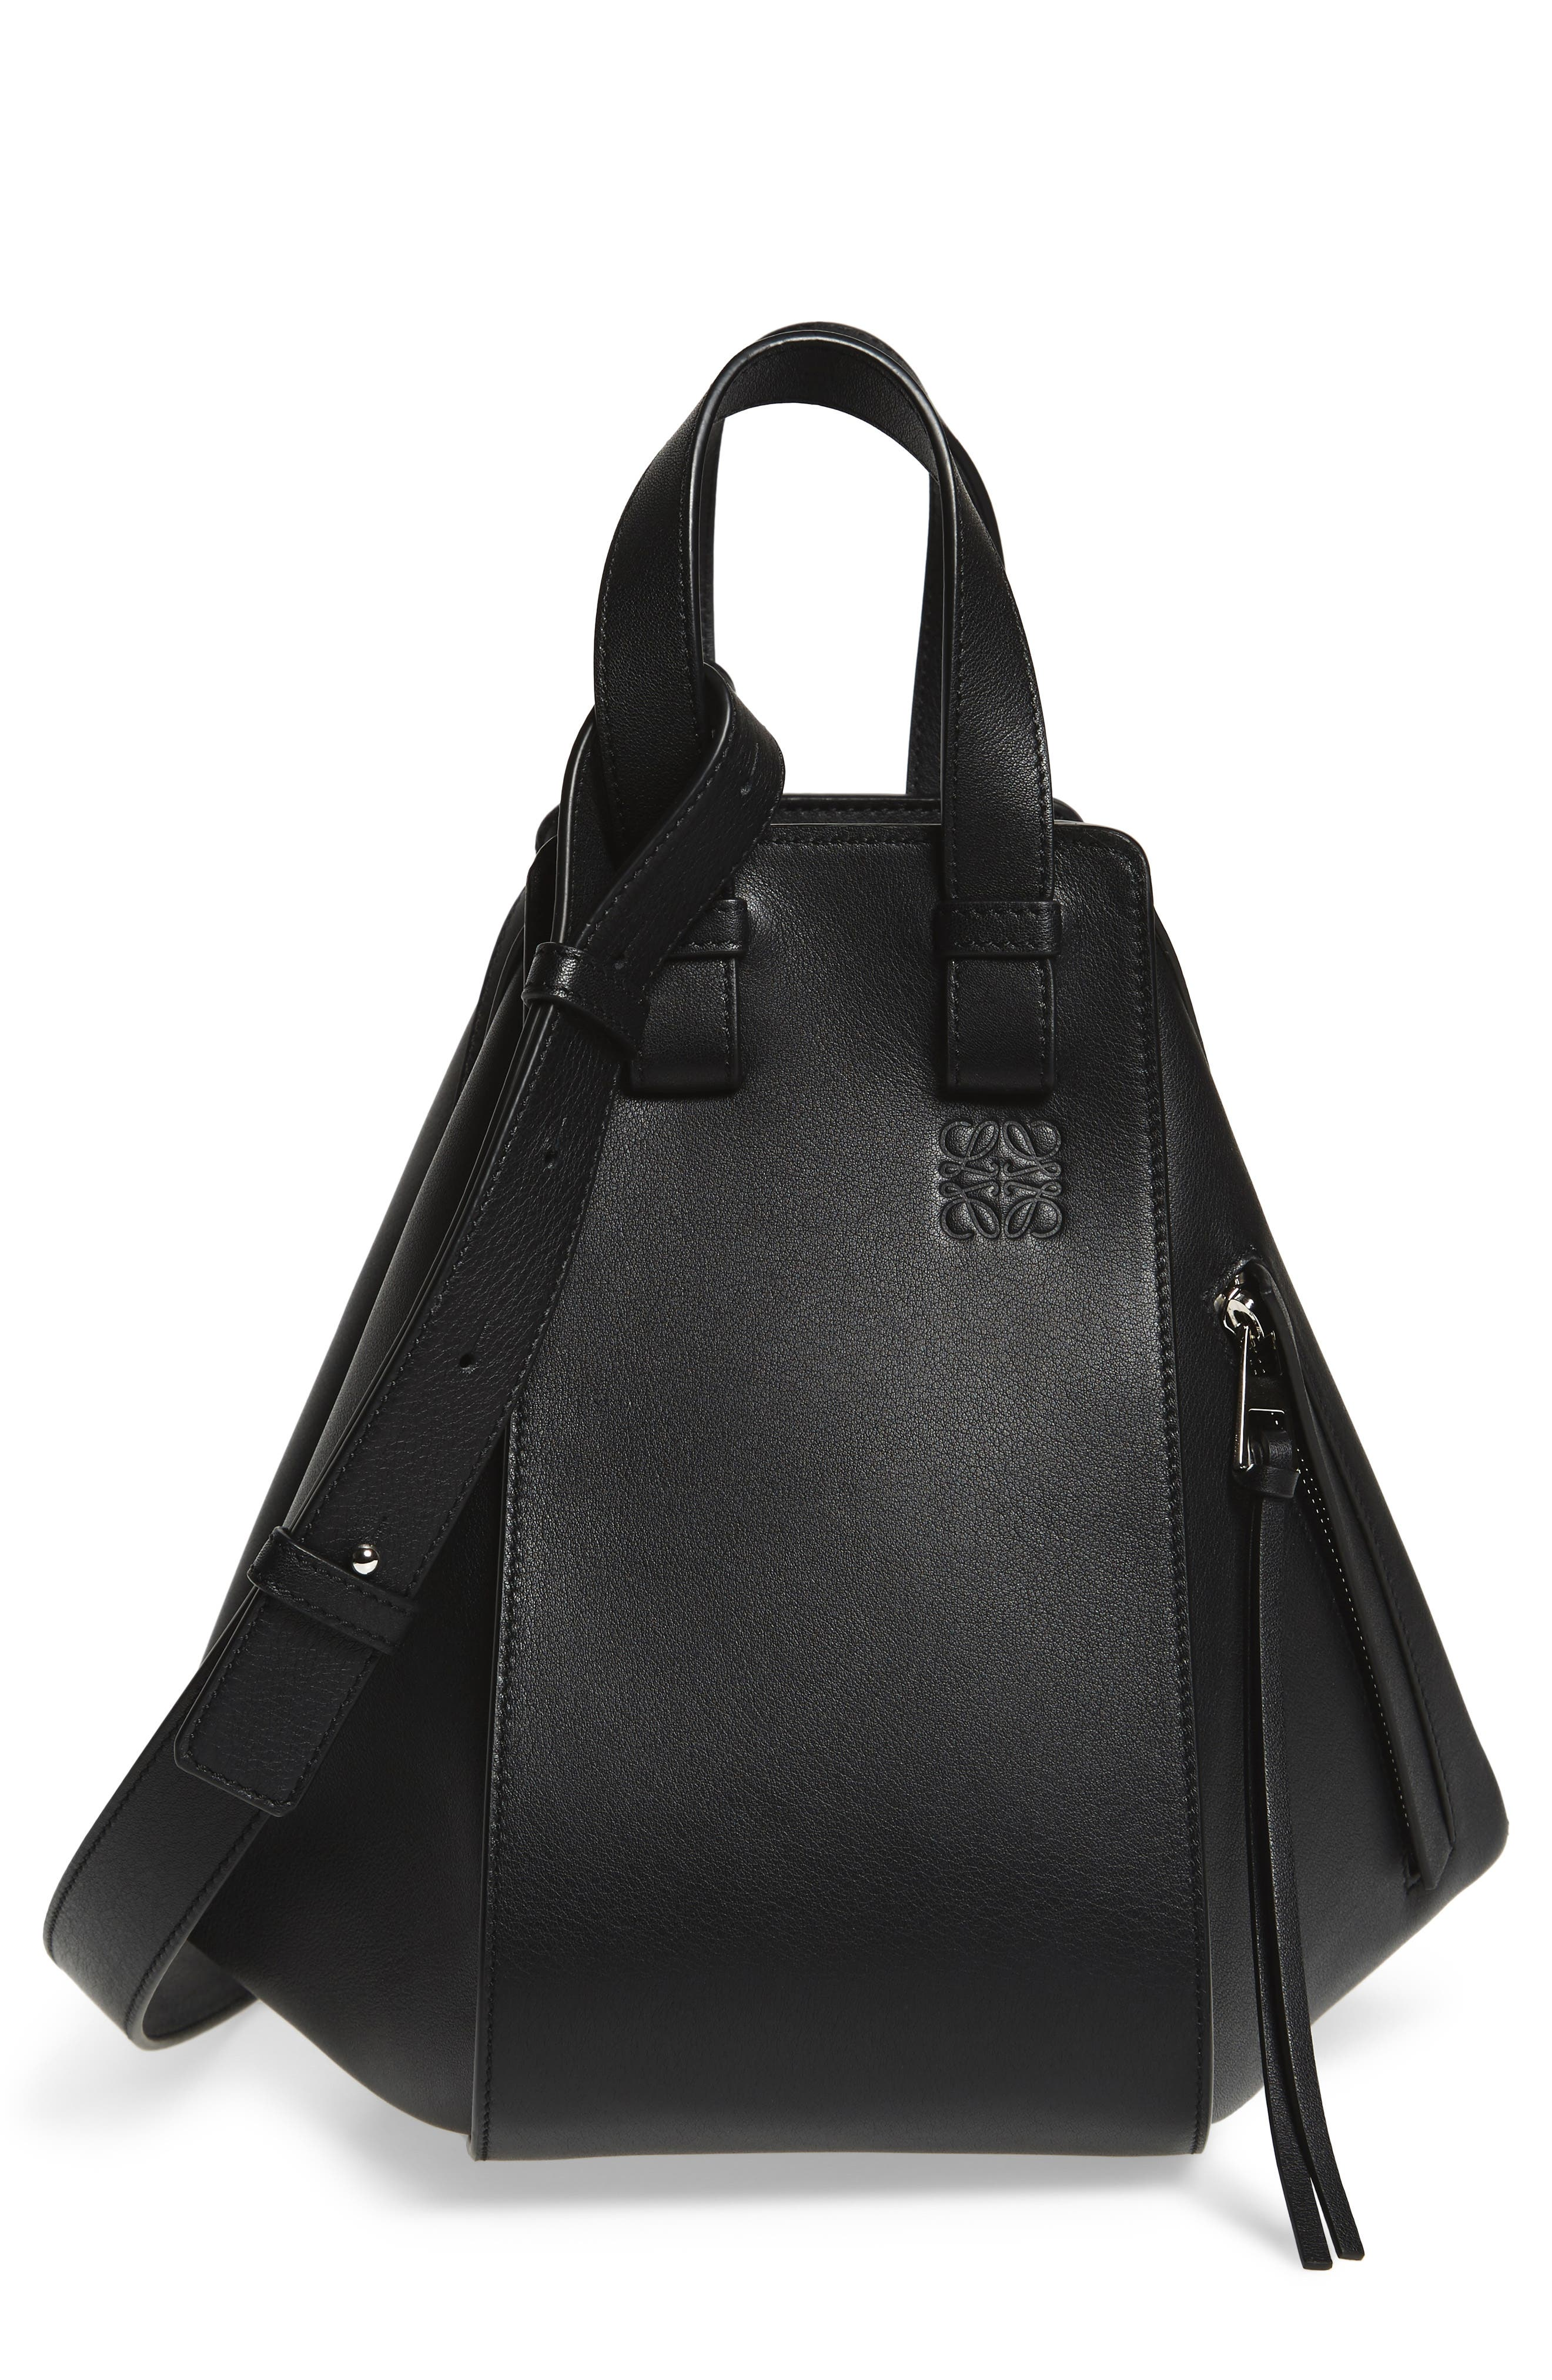 Alternate Image 1 Selected - Loewe Small Hammock Leather Hobo